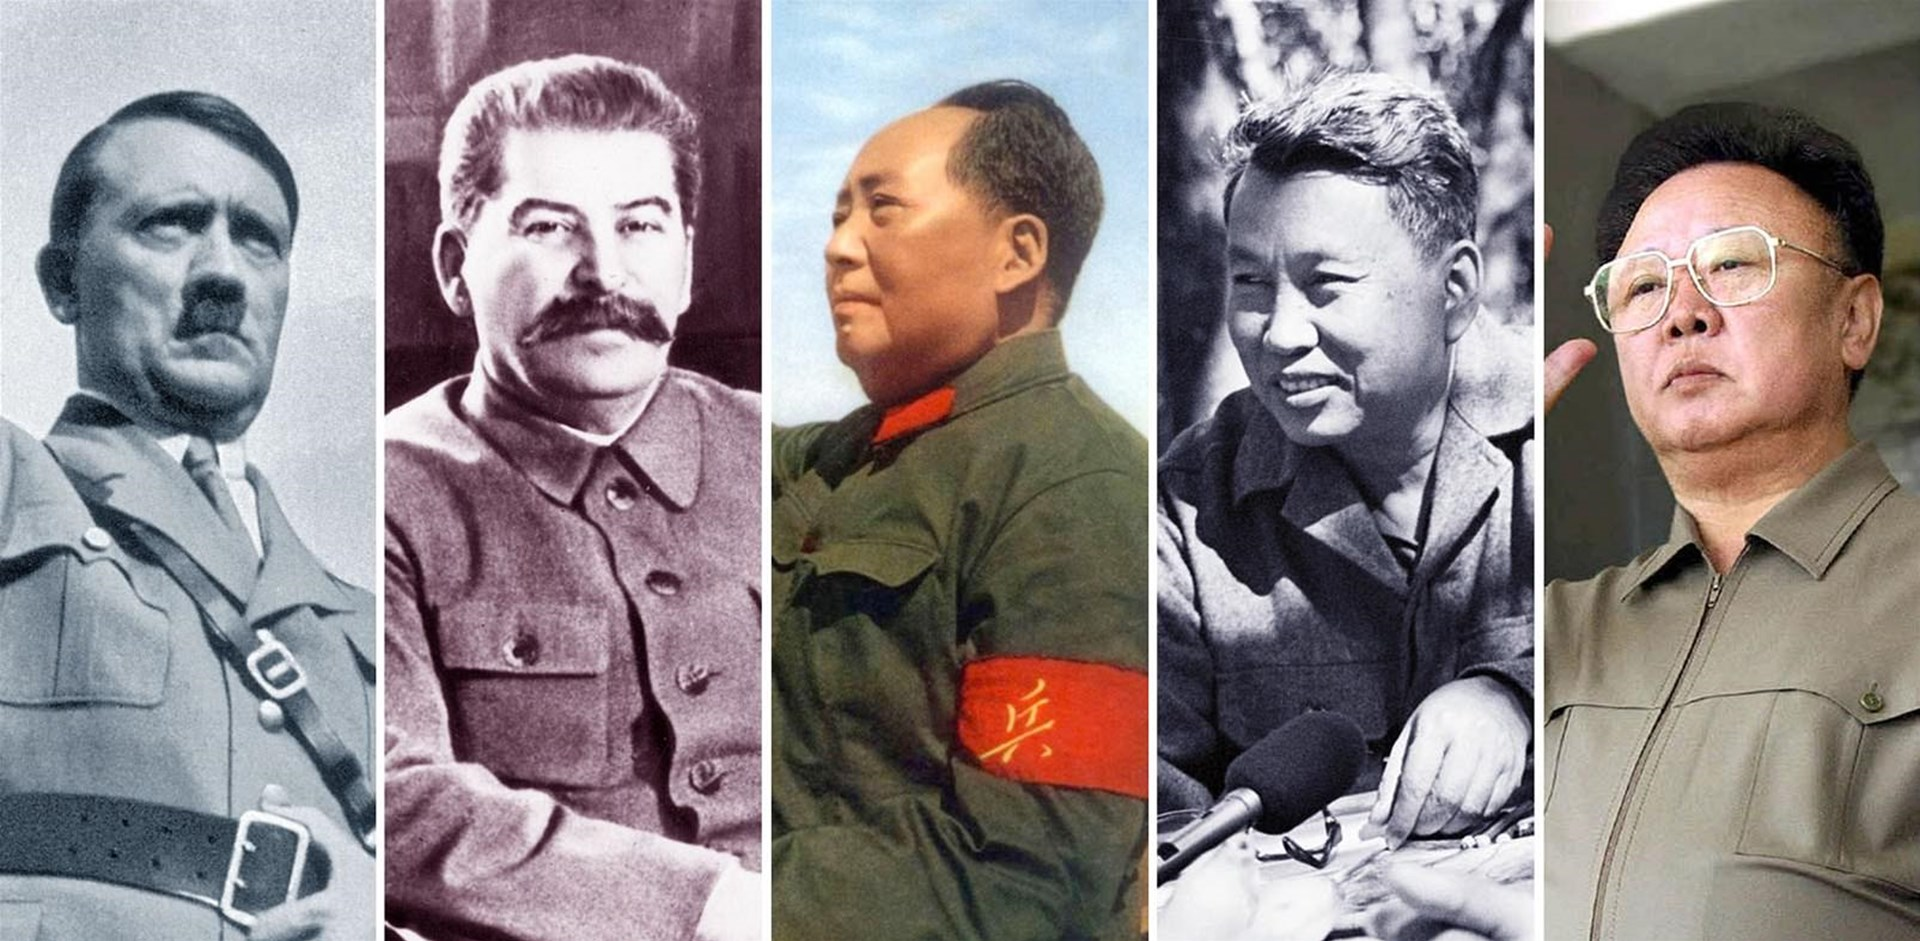 Image result for mao zedong hitler stalin media